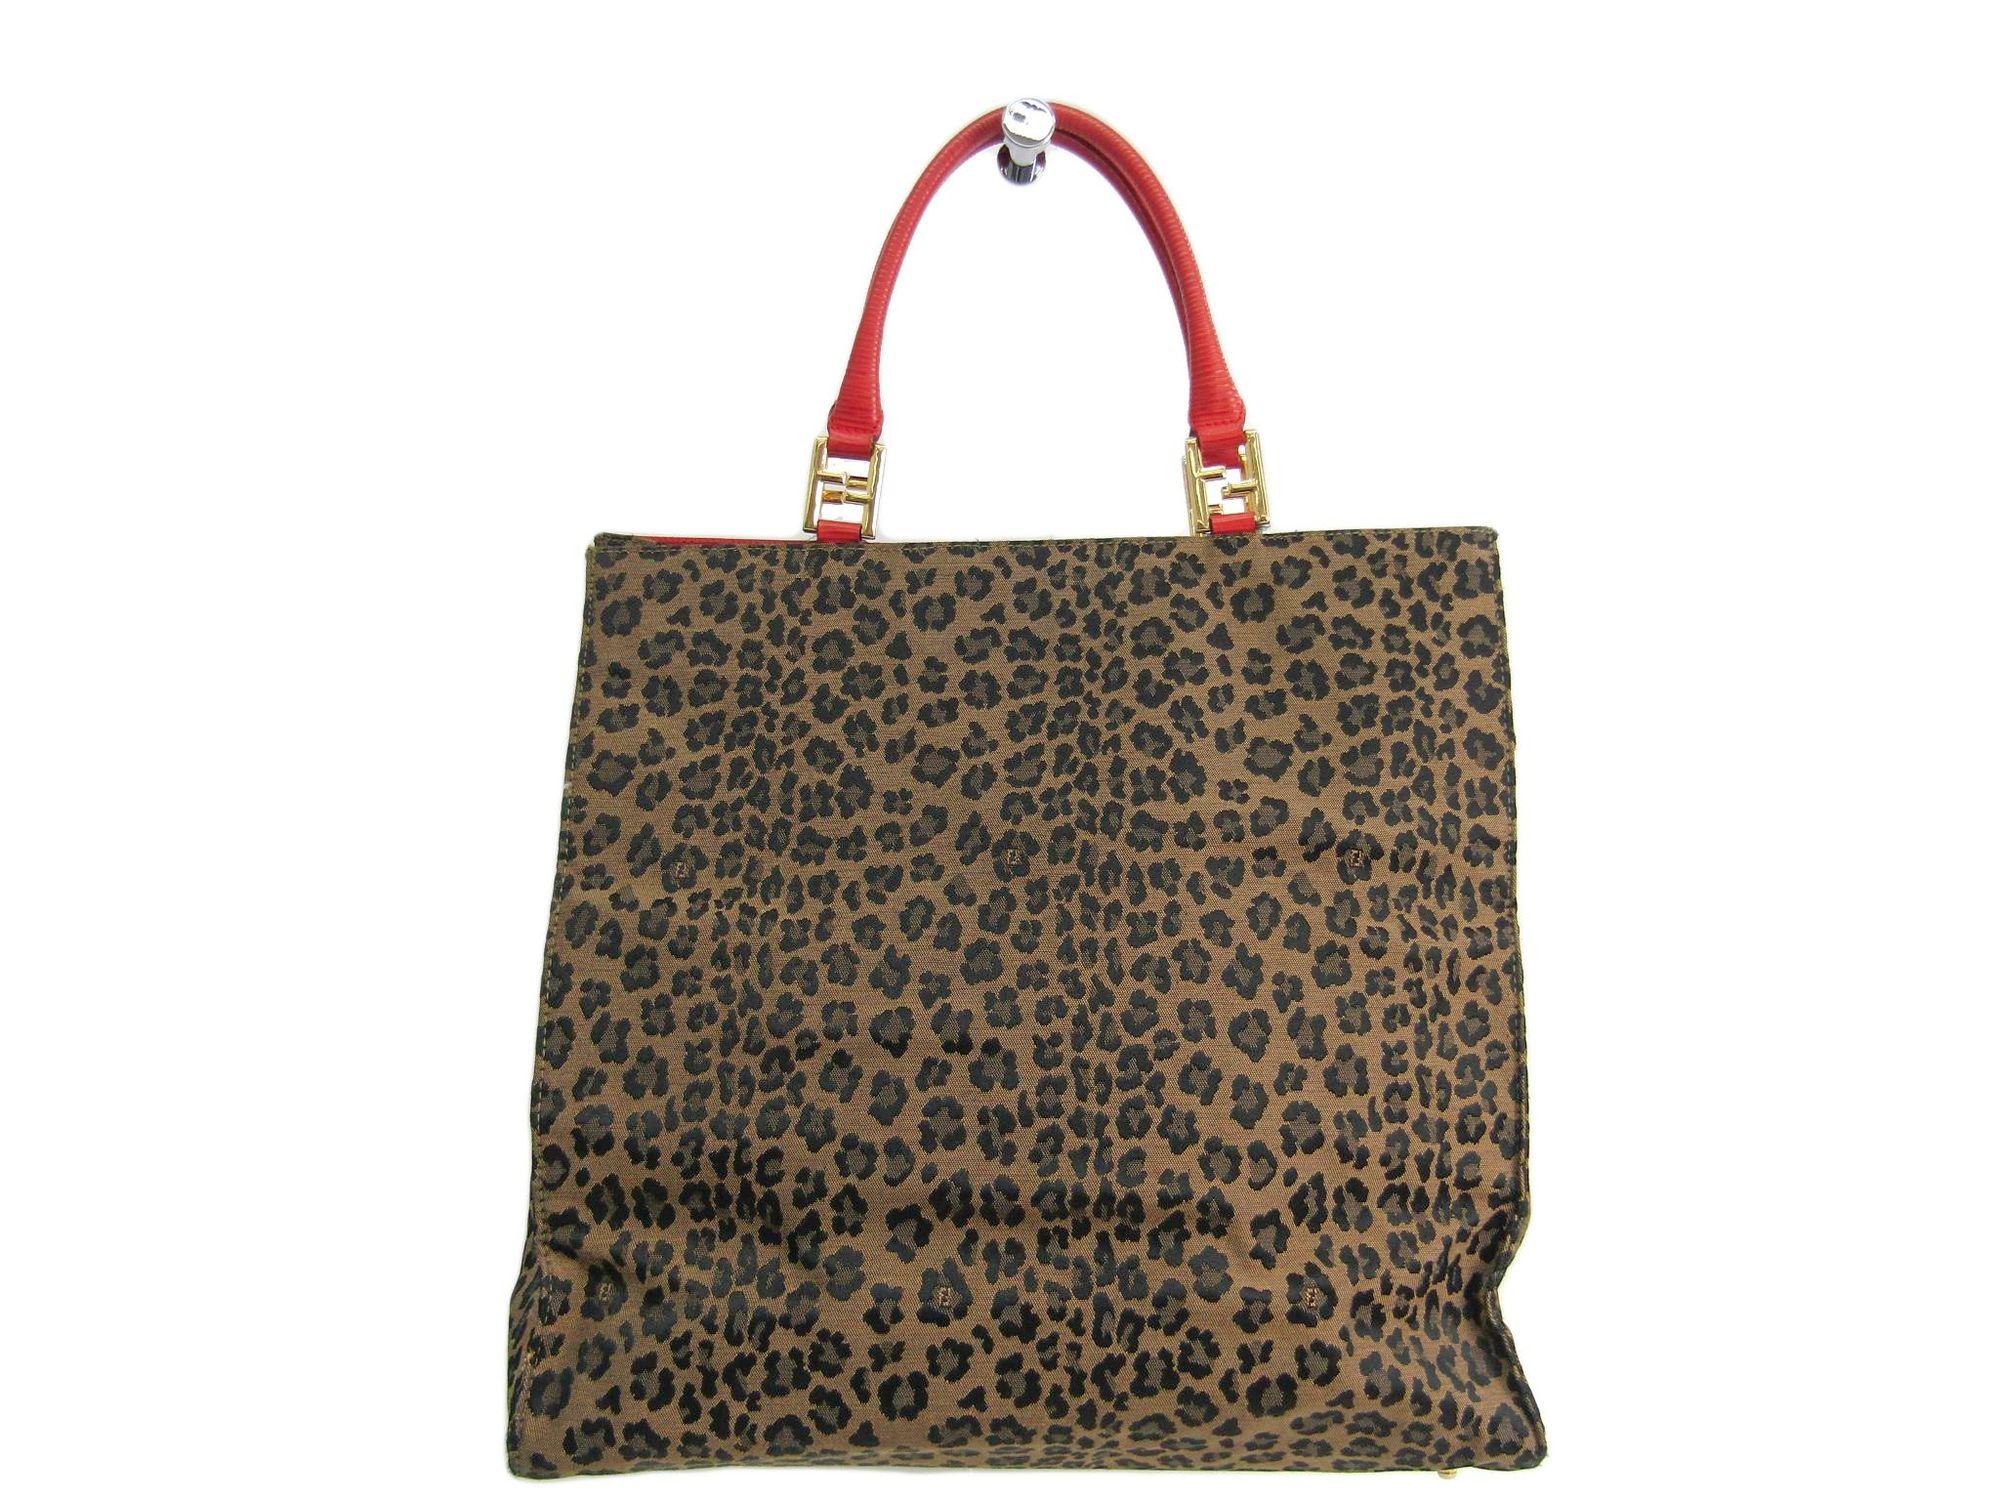 25e573525c Fendi Tote Bag Leopard Canvas   Leather Beige   Red 261910 BF302455 ...